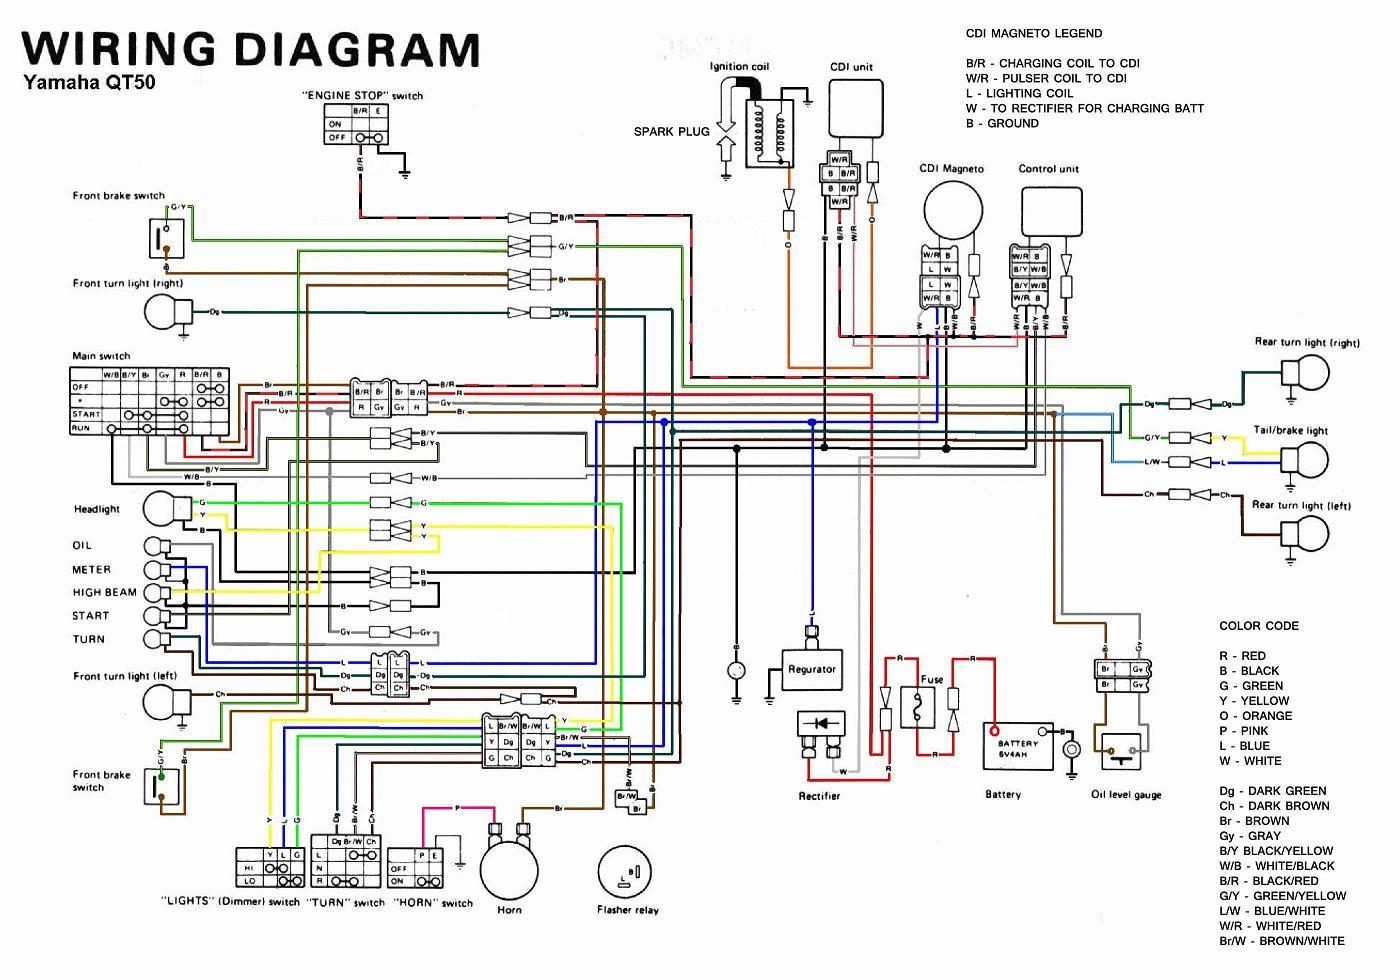 Wiring Diagram Of Yamaha Jog - Wiring Diagram Features on